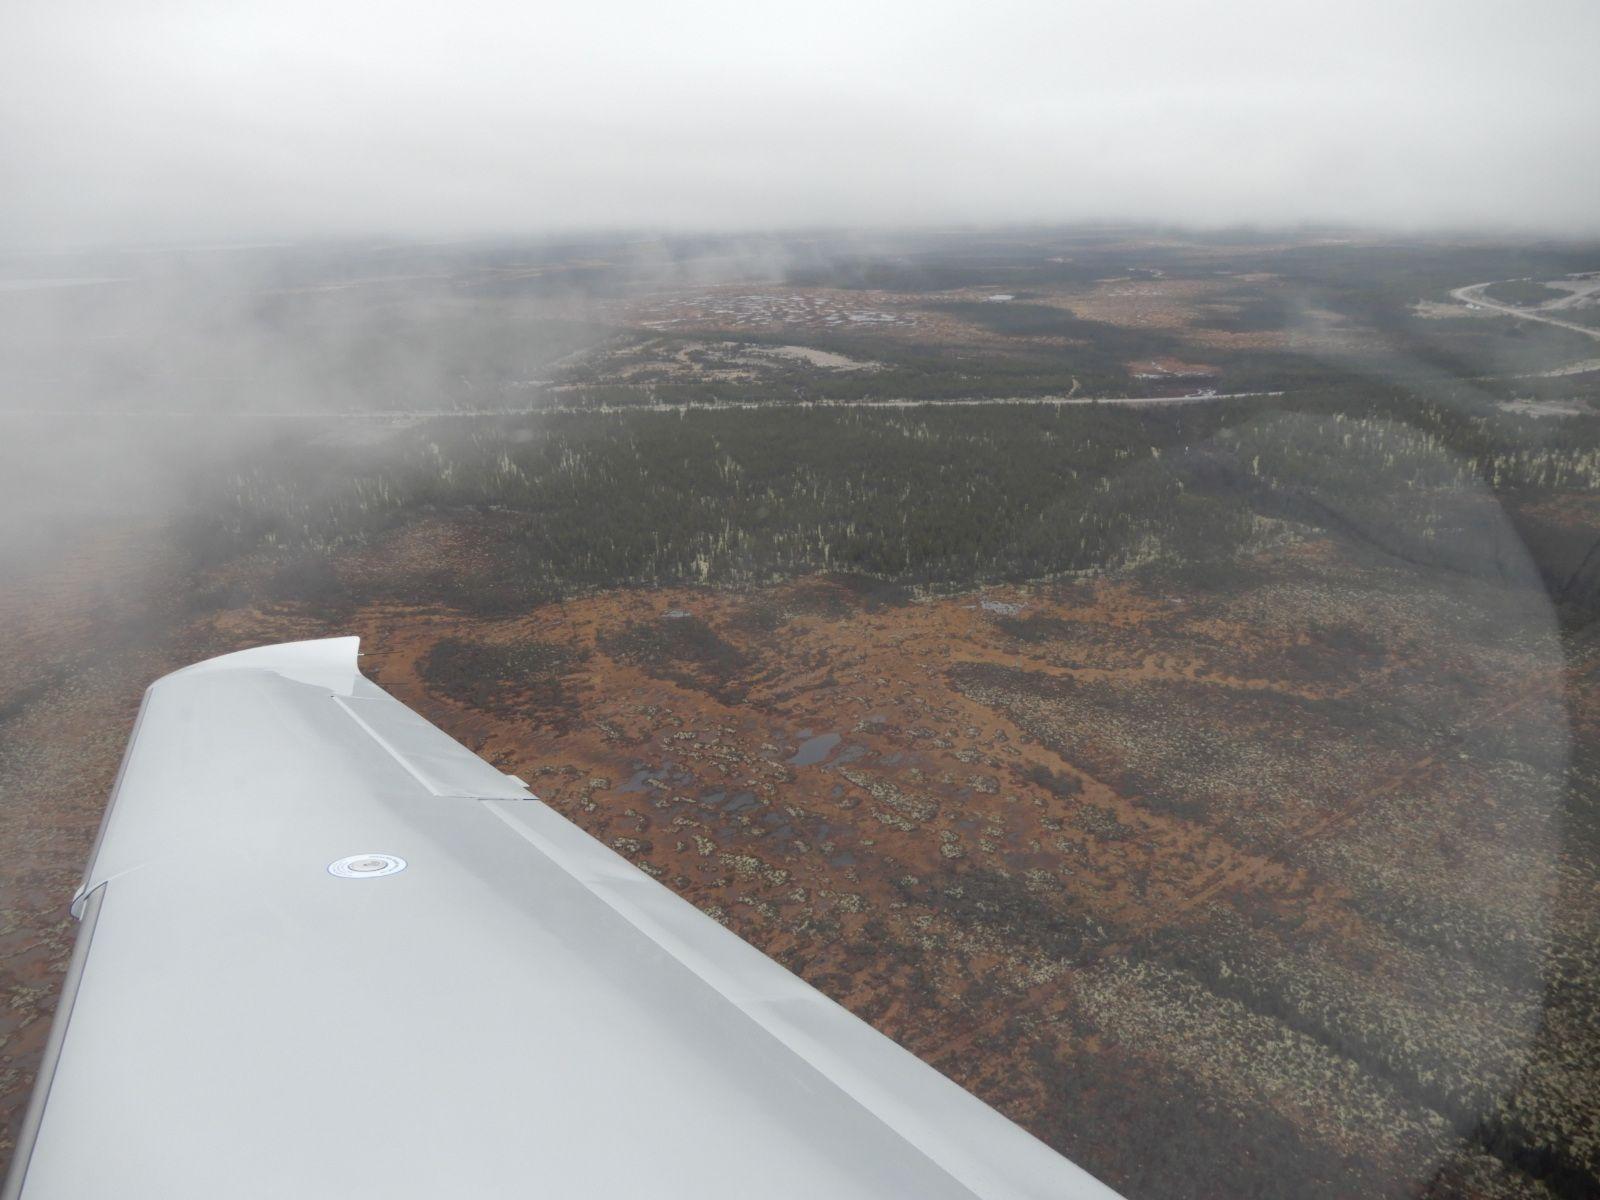 Po vzletu z letiště La Grande Riviere (CYGL), Quebec, Kanada